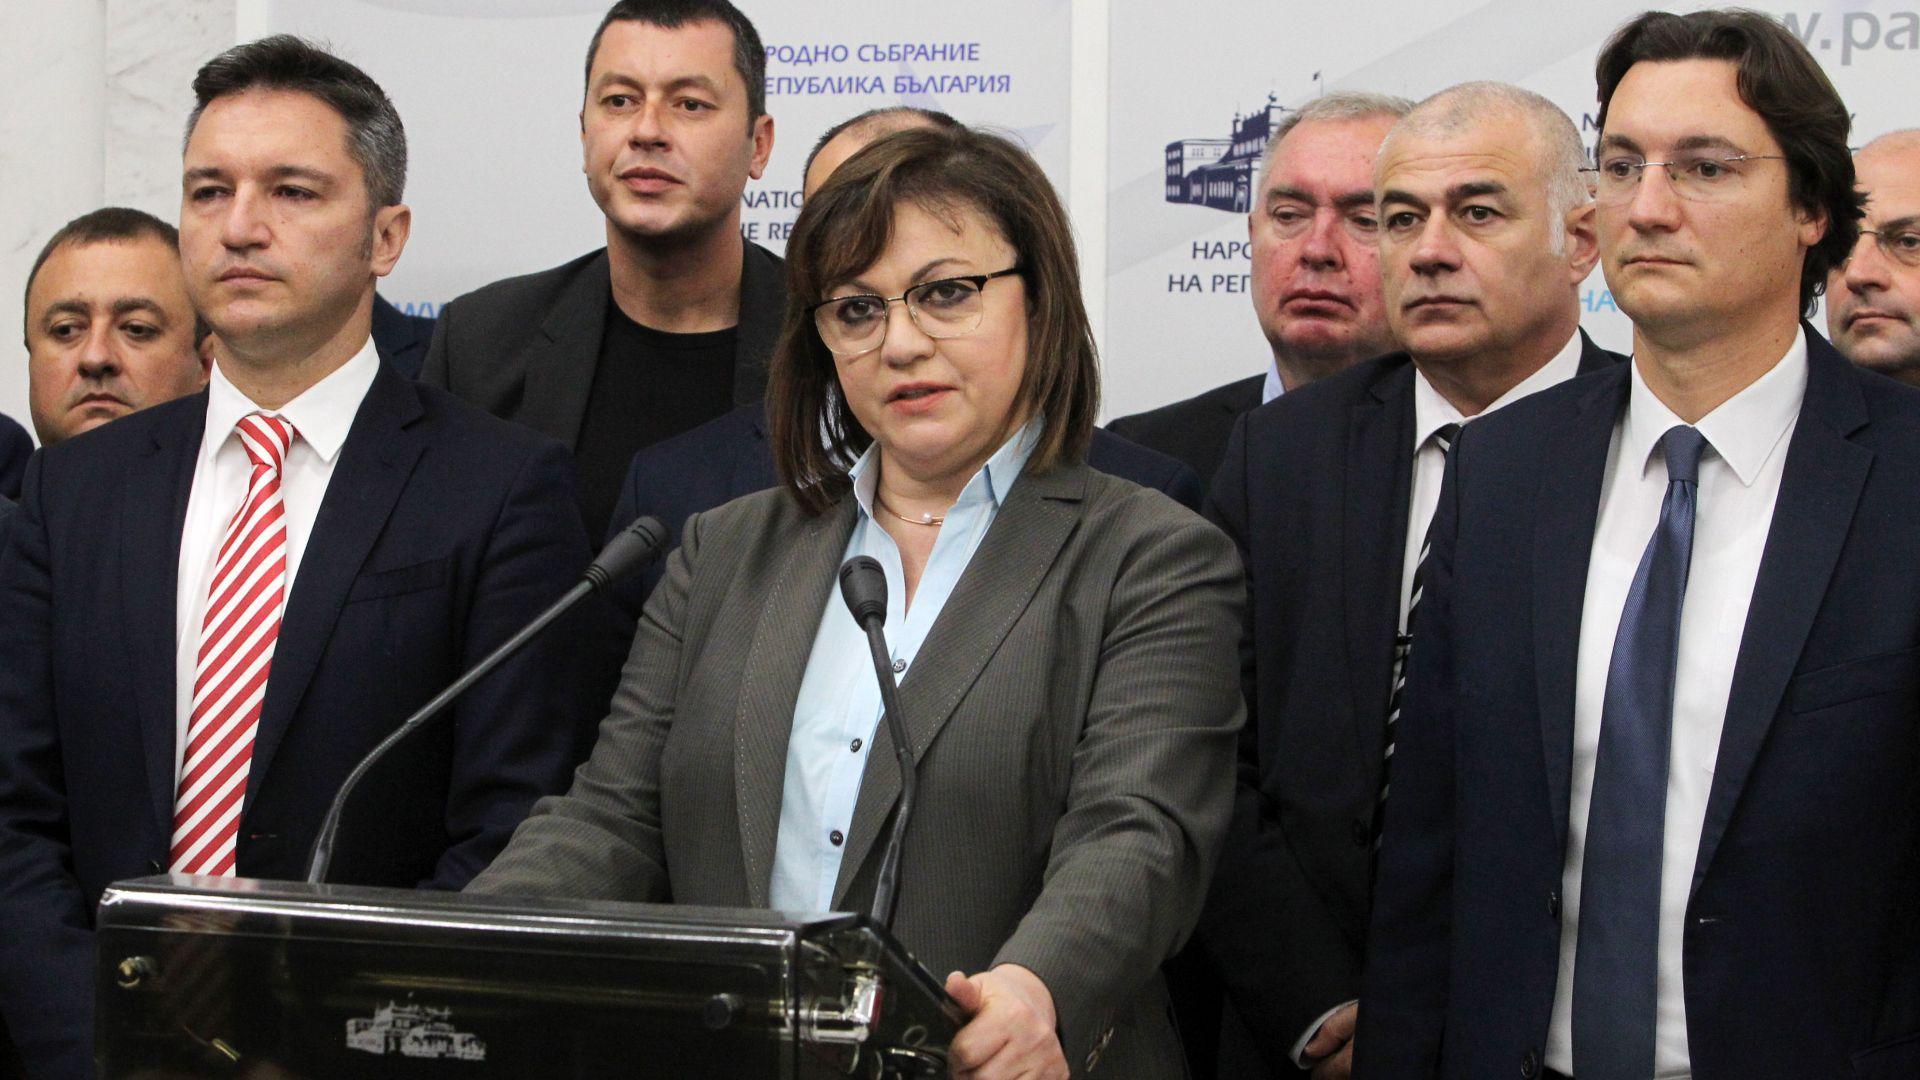 Цялата група на БСП зад Нинова: Отцепниците да напуснат парламента (снимки)